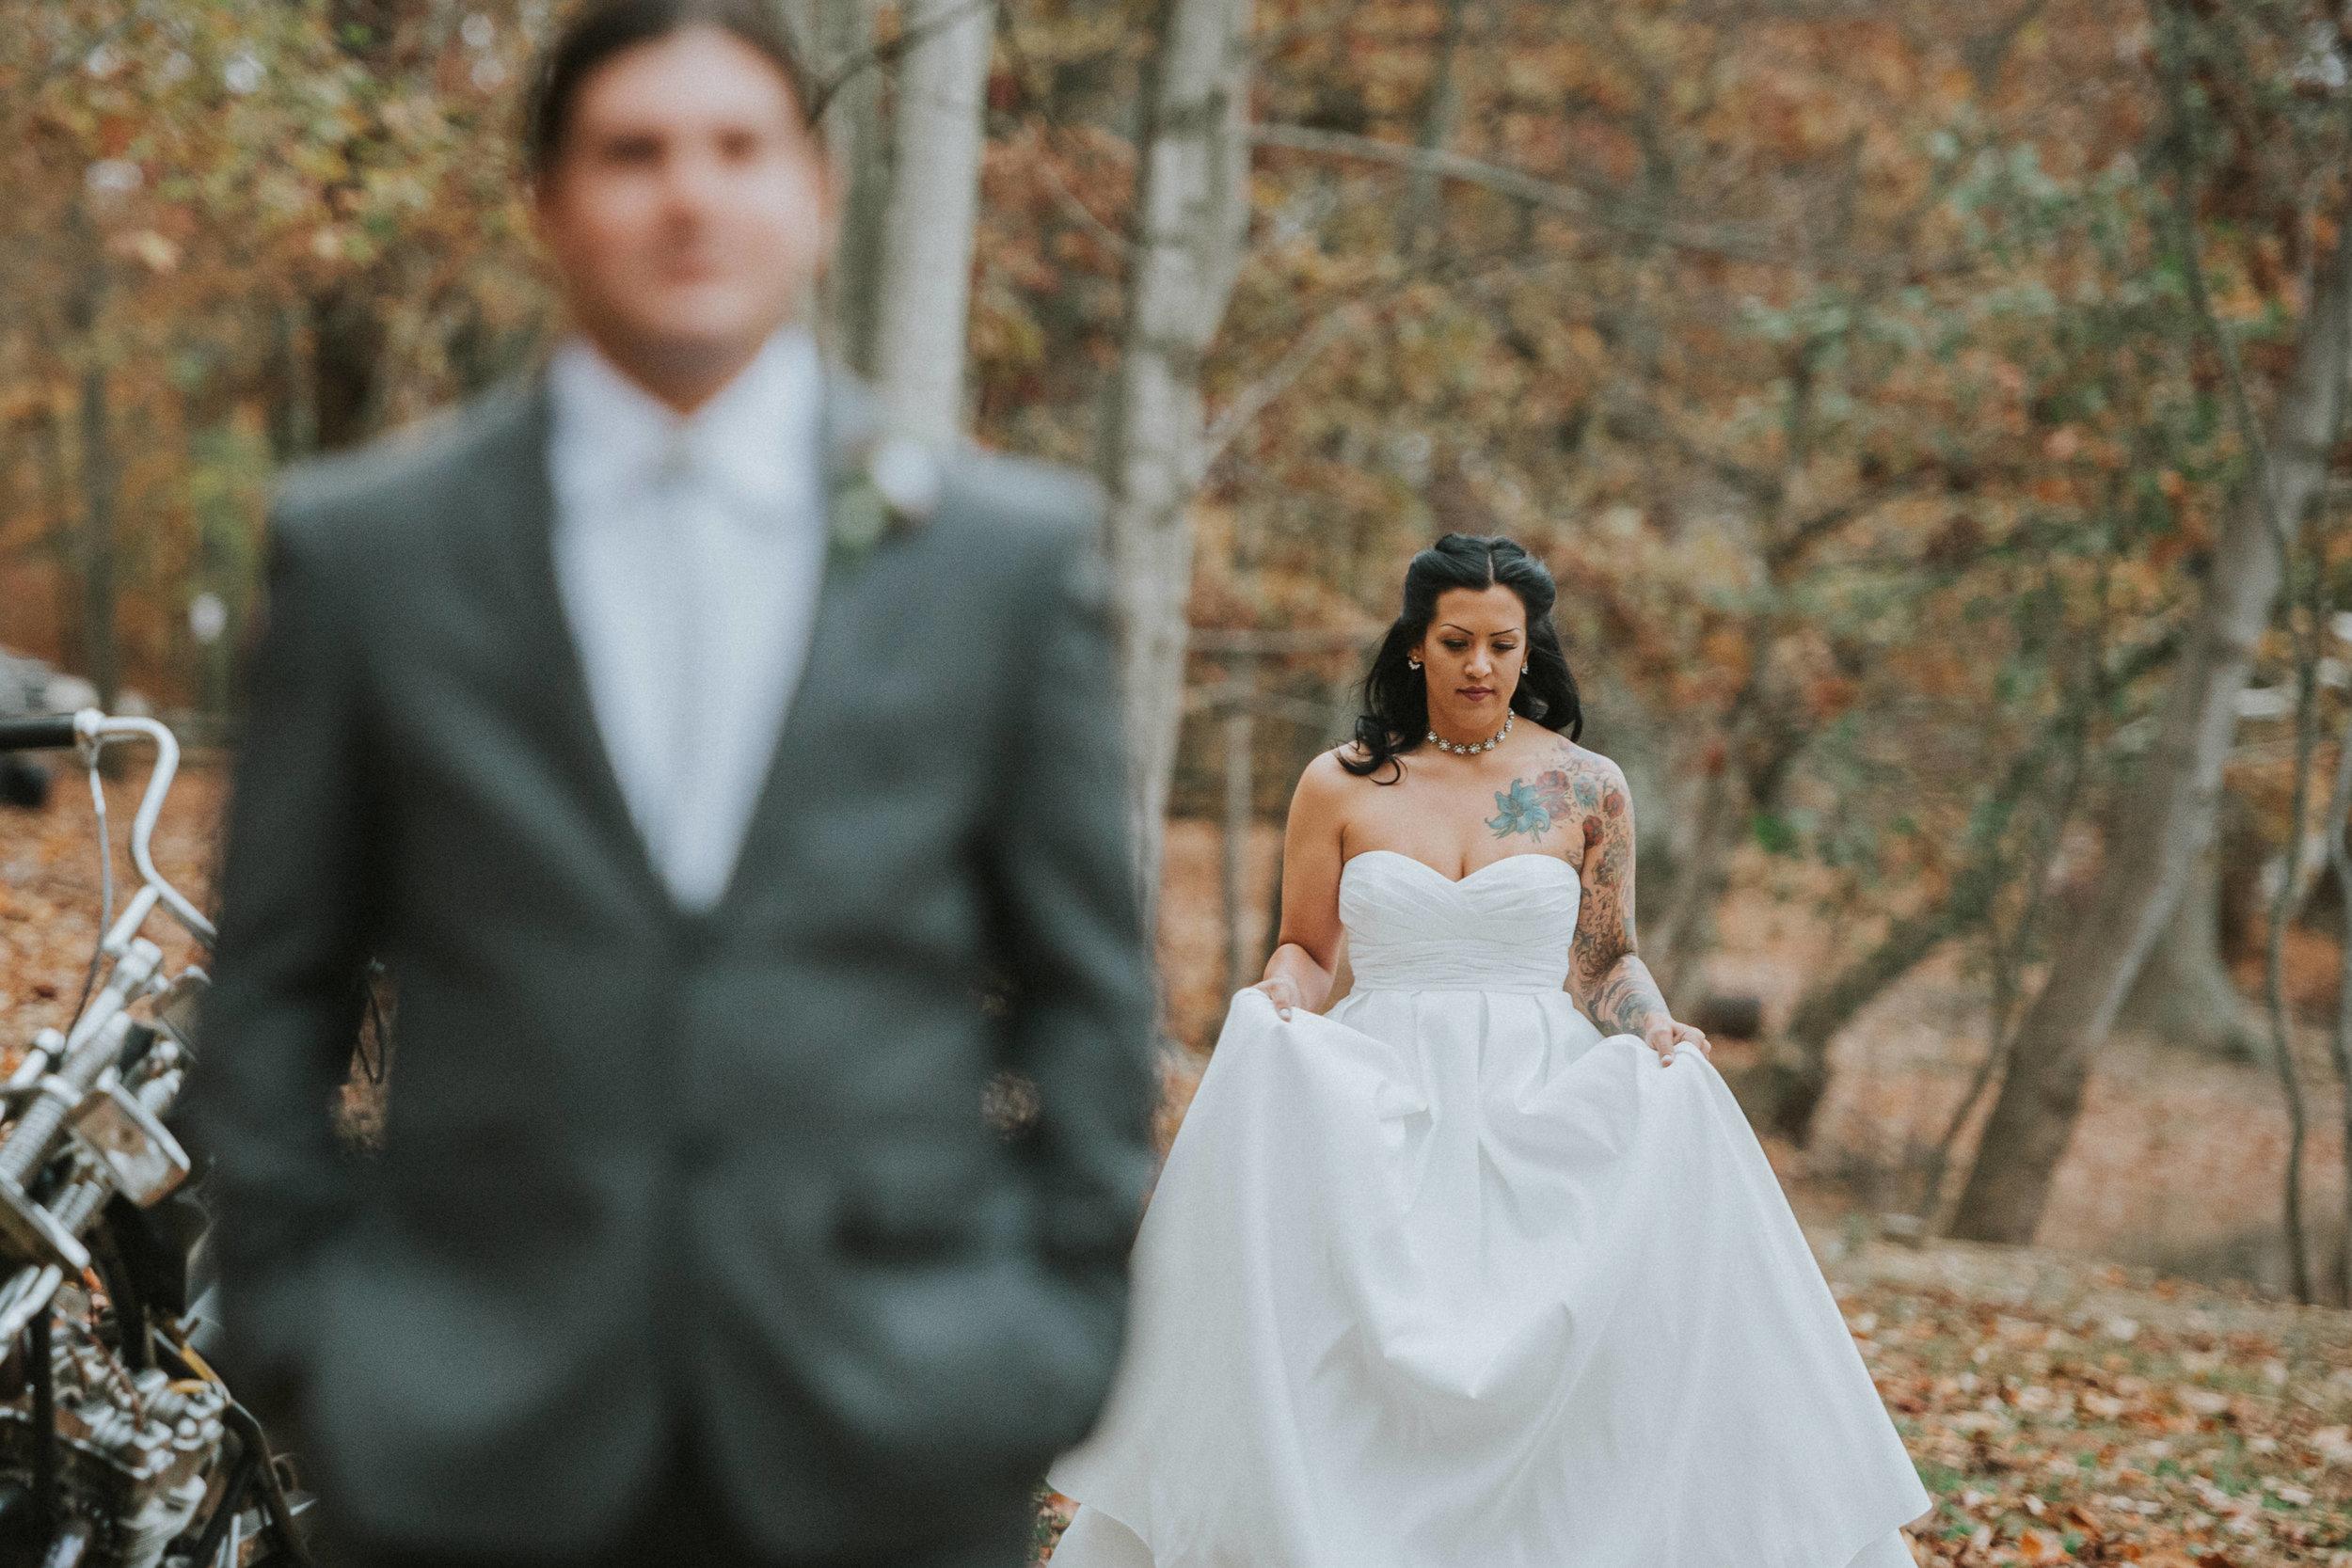 Rodes-Barn-Wedding-Mackenzie-and-Dylan-109.jpg